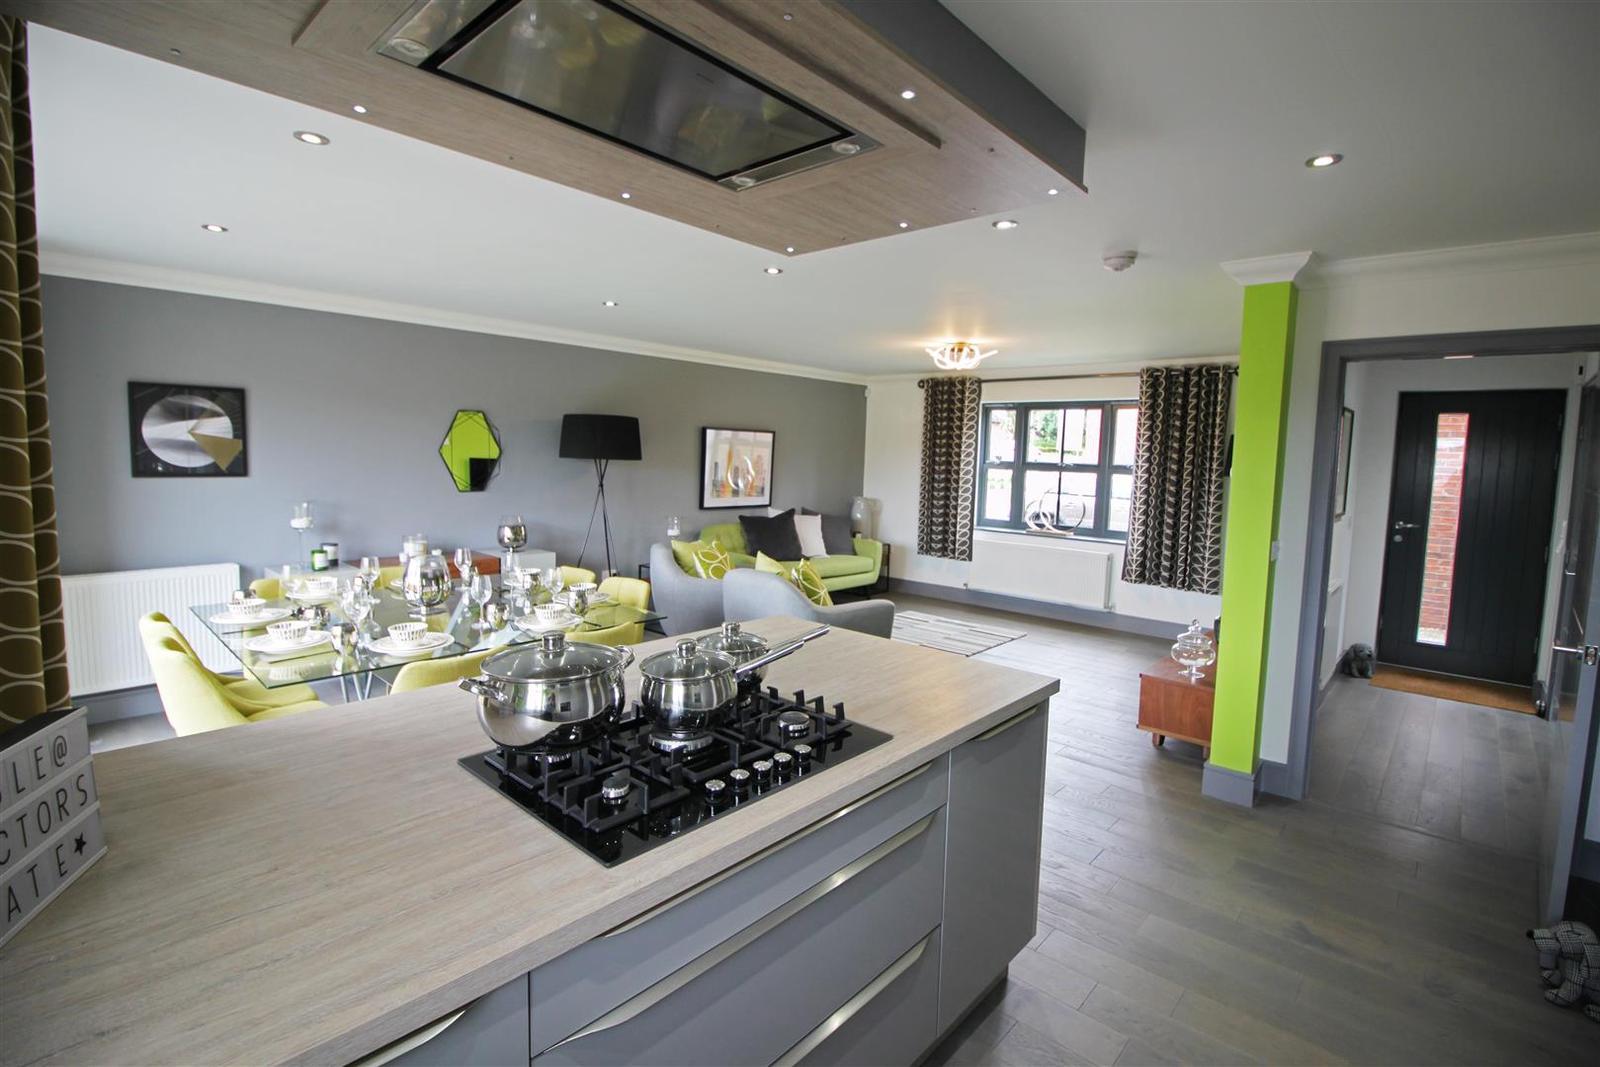 3 Bedrooms Property for sale in Rectors Gate, Retford